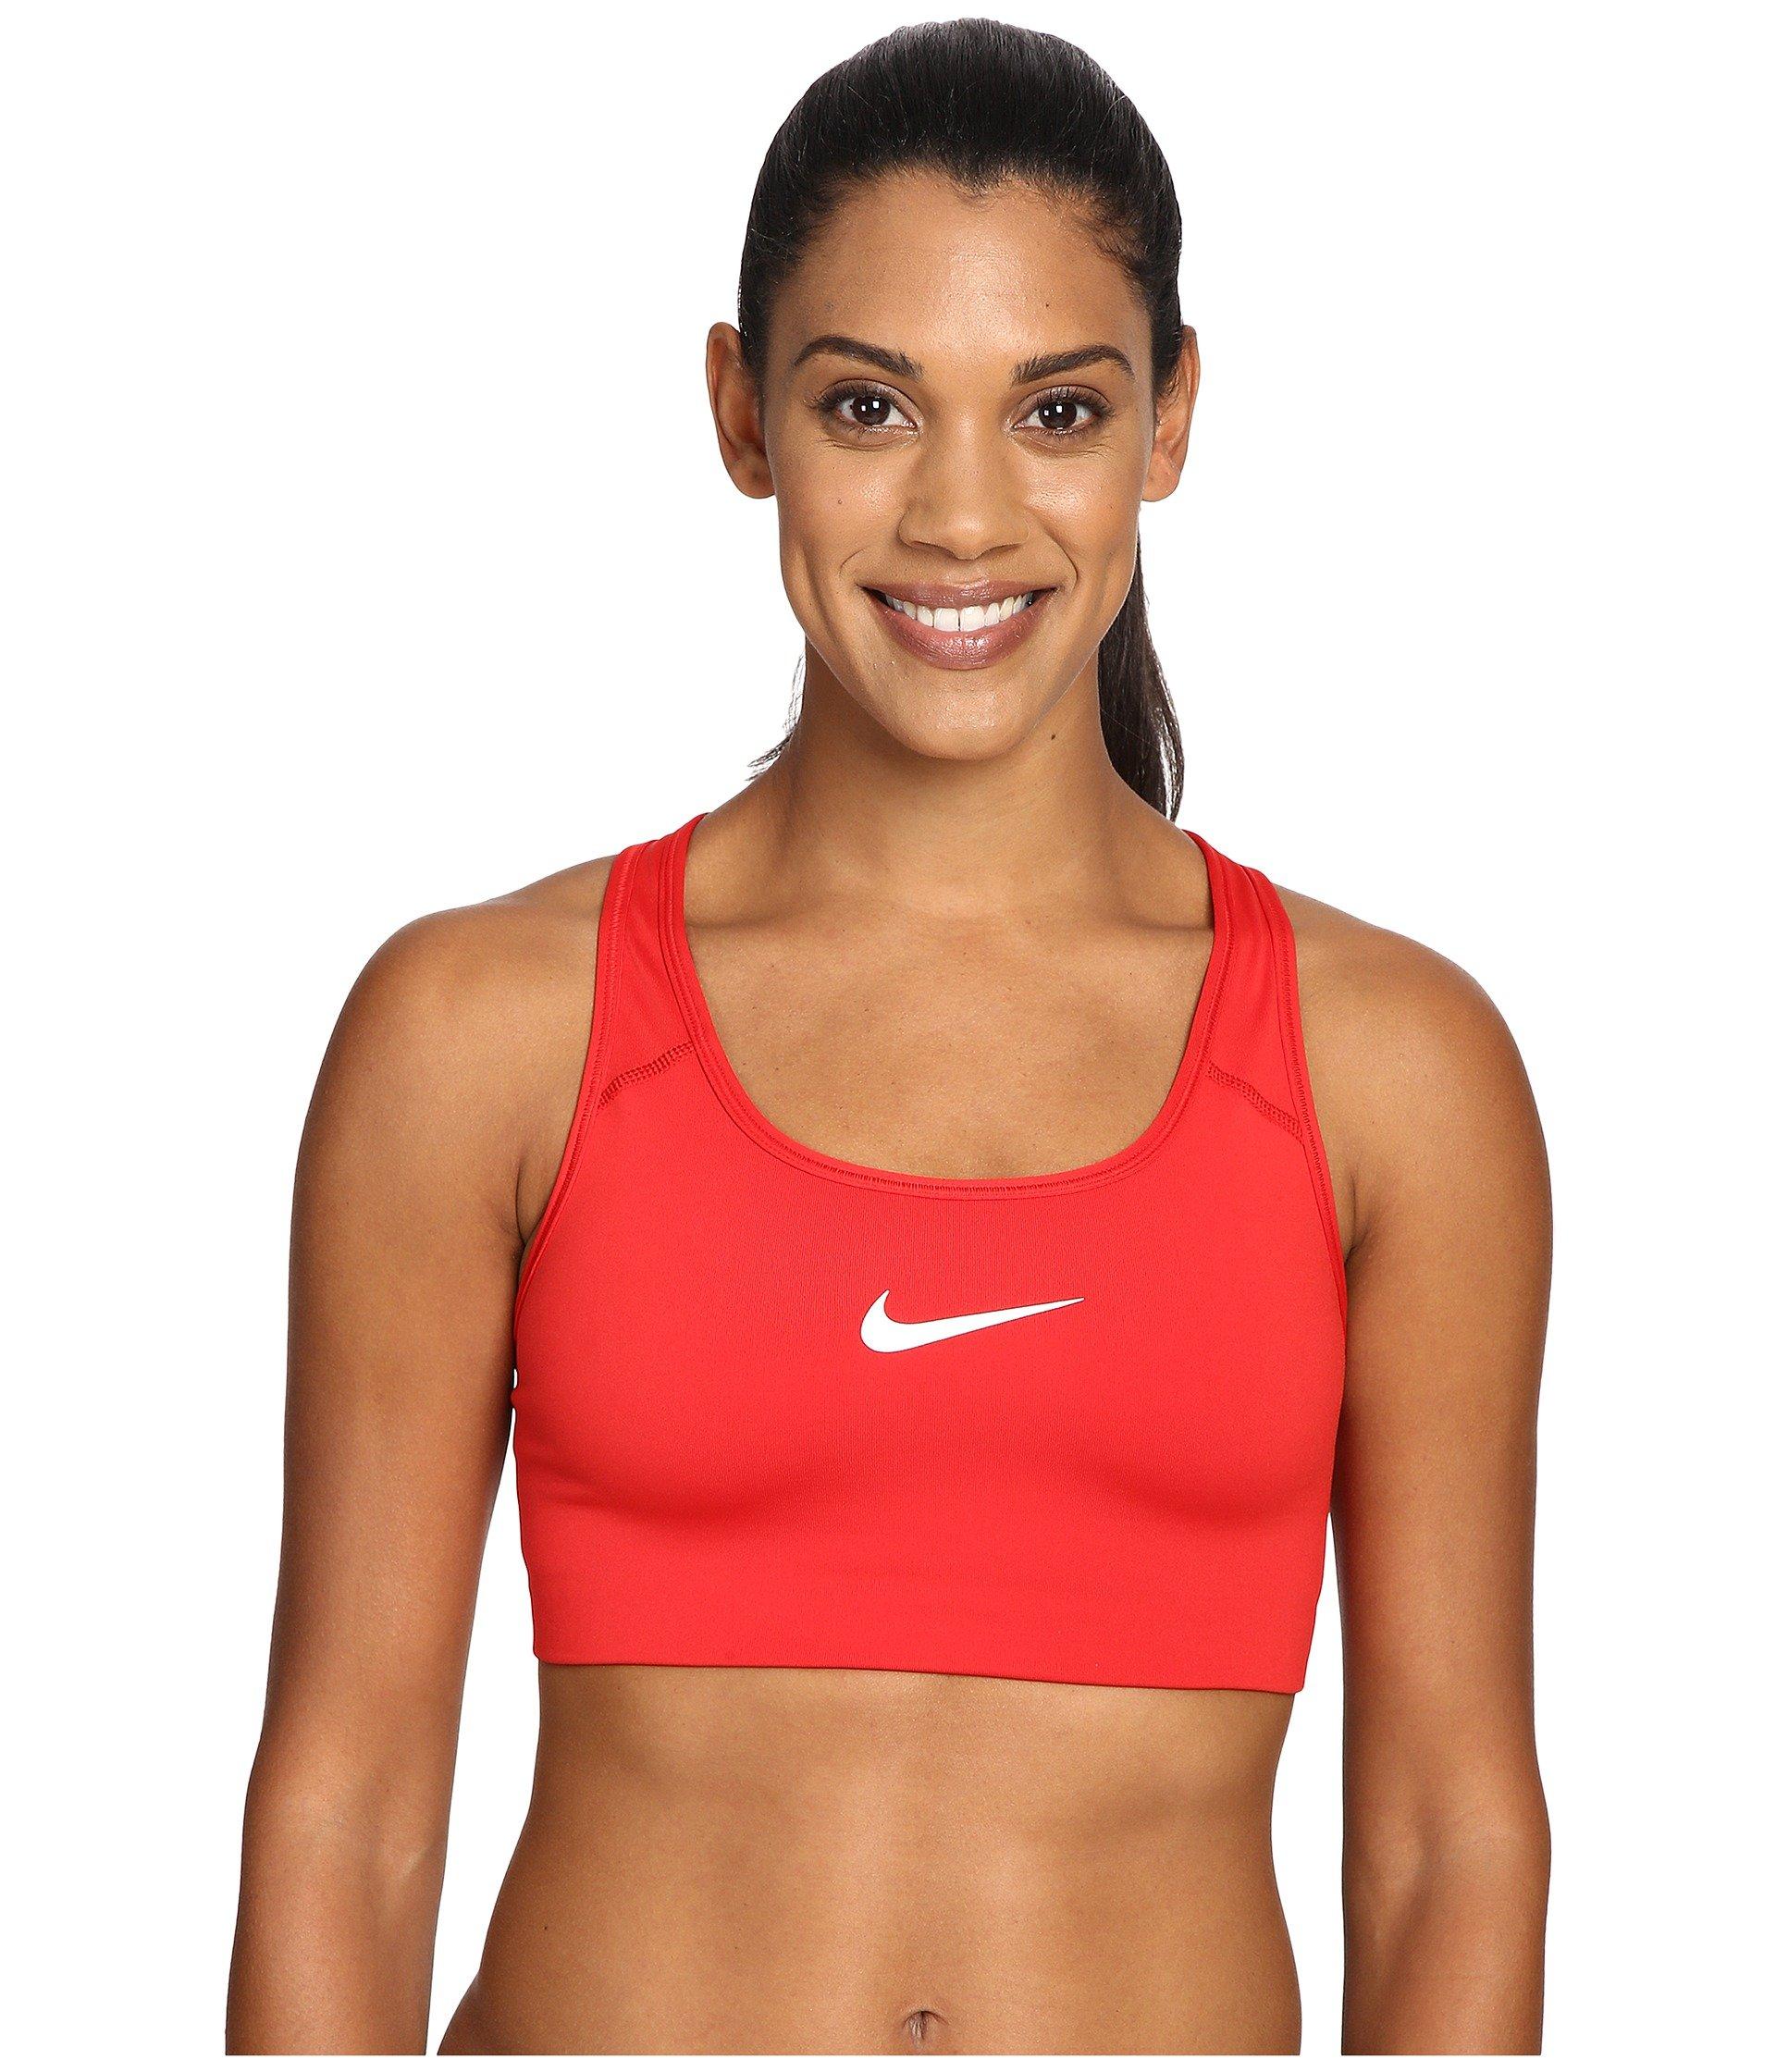 Nike Wom Pro Classic Swoosh Bra SM Red